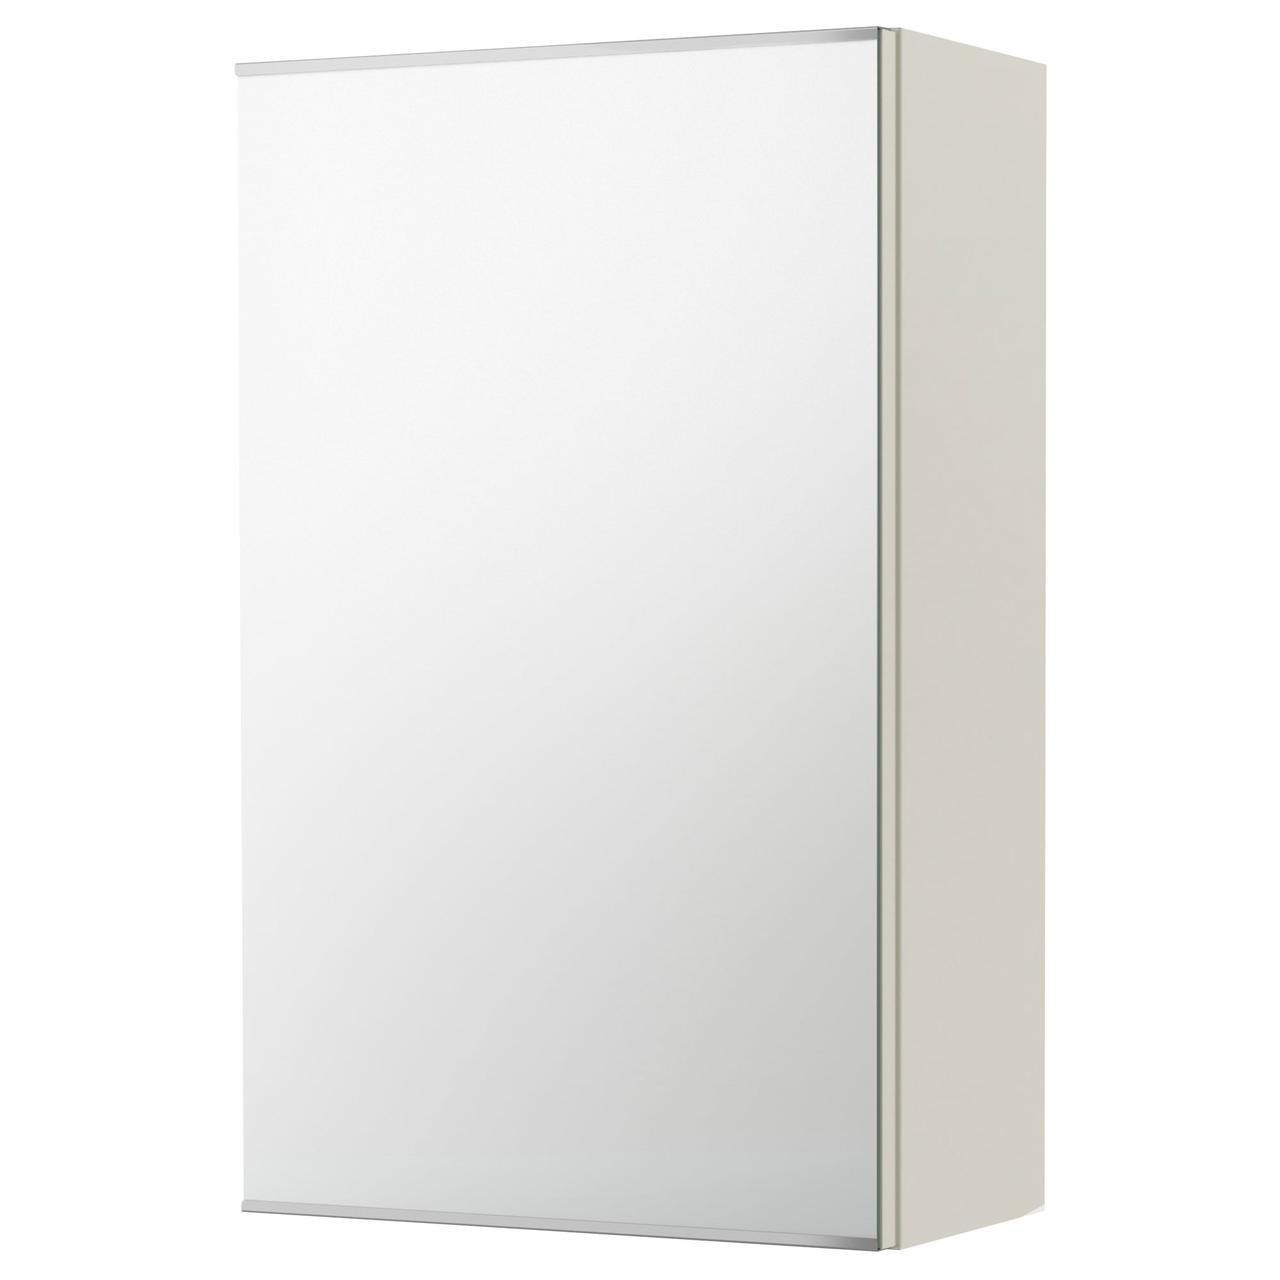 ЛИЛЛОНГЕН Зеркальный шкаф с 1 дверцей, белый